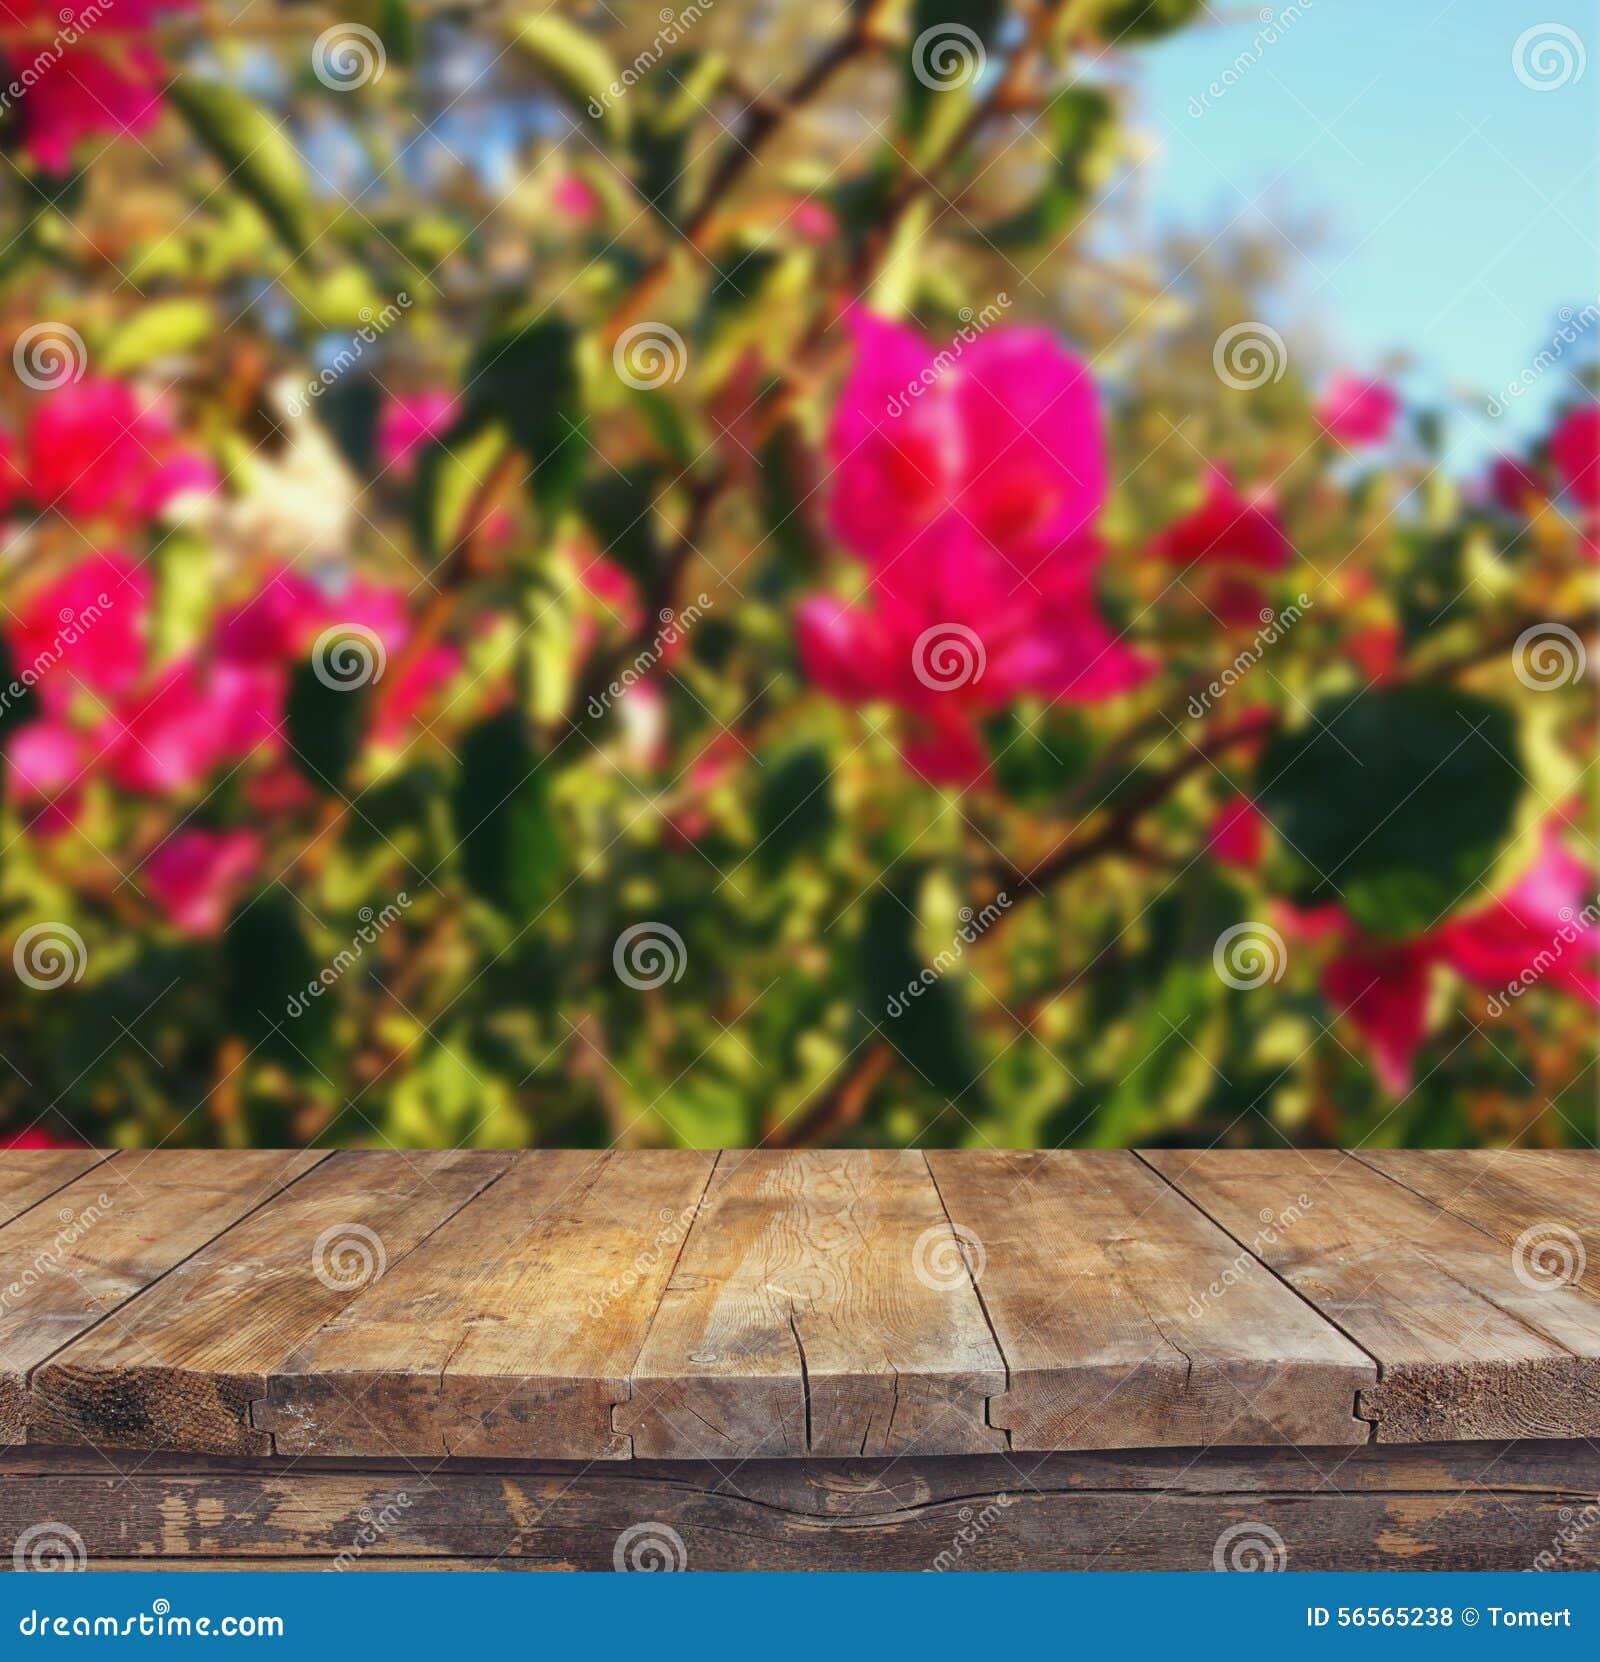 Download Ξύλινος πίνακας πινάκων μπροστά από το καλοκαίρι Landscap της άνθισης λουλουδιών Στοκ Εικόνες - εικόνα από αγροτικός, σχέδιο: 56565238